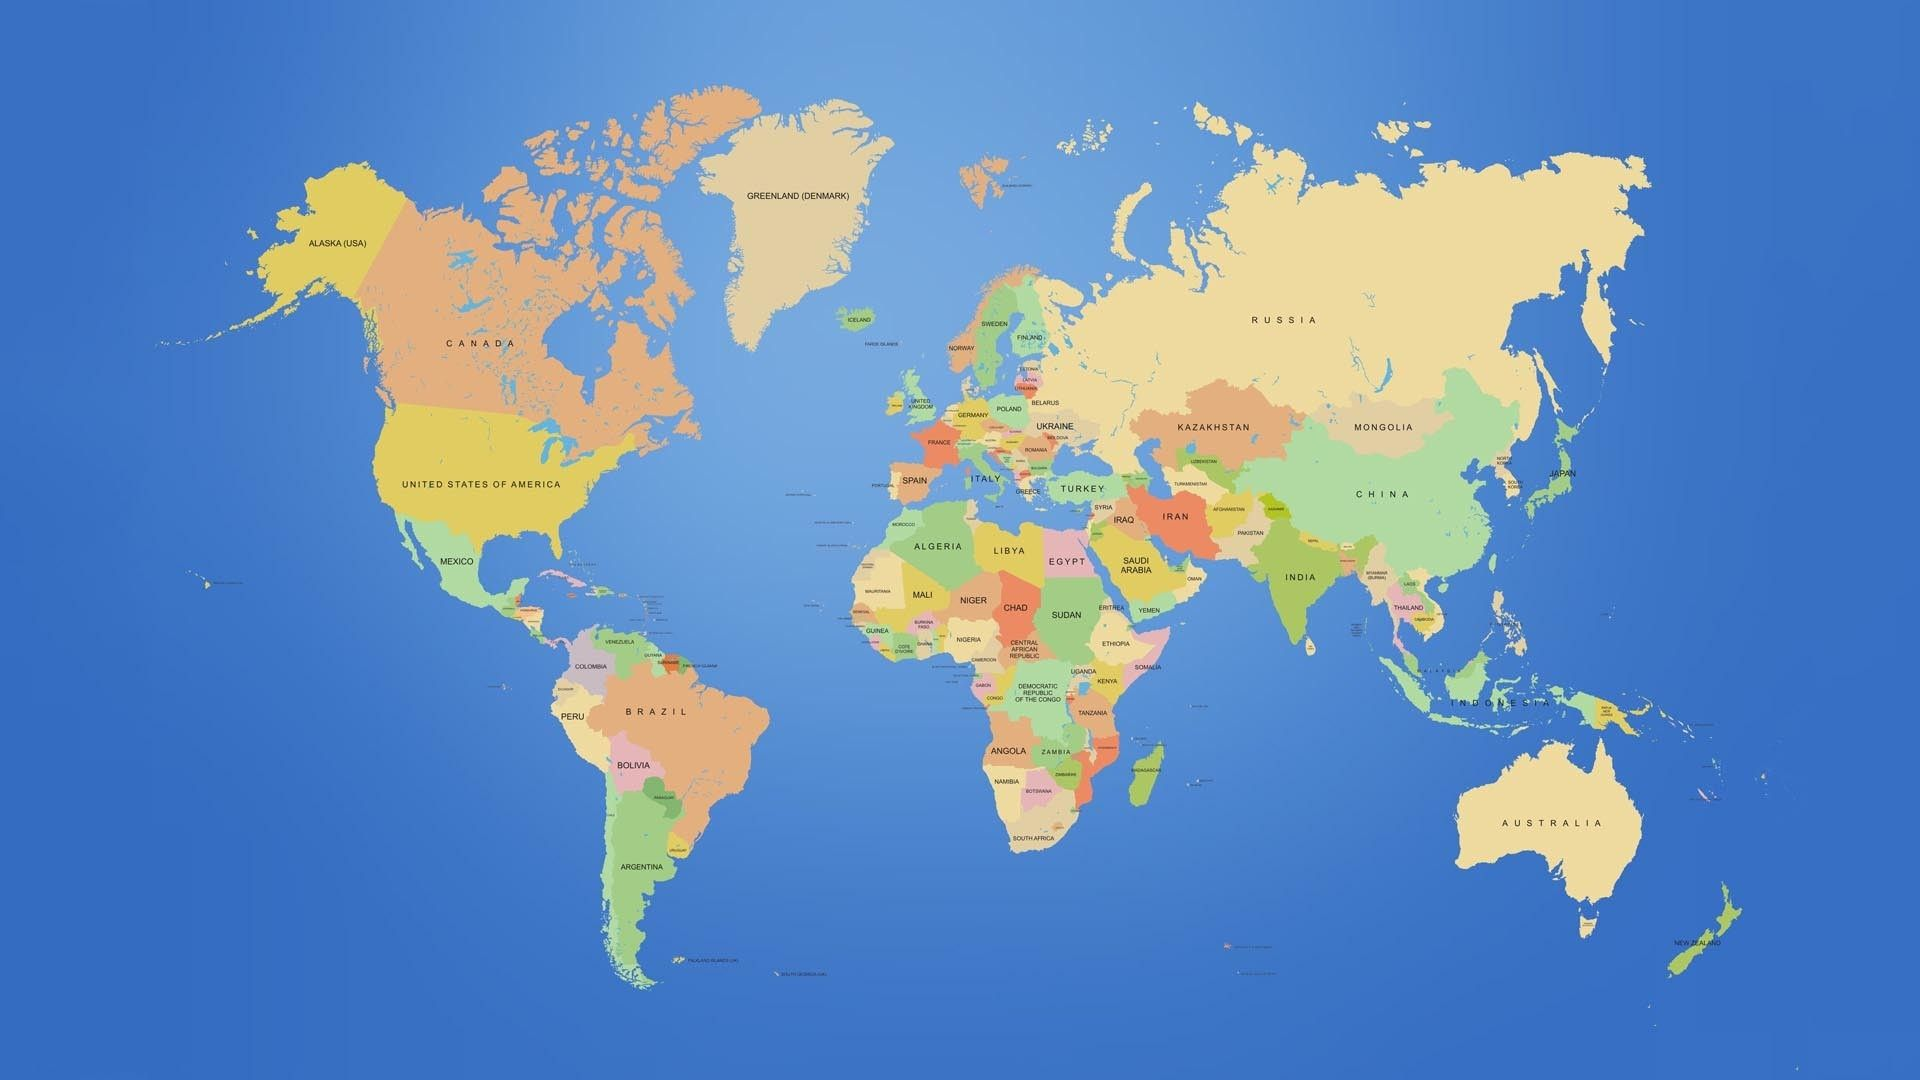 Ibm World Map Wallpaper Valid World Map Wallpaper High Resolution Cbac Of Ibm World Map Wallpape World Map Picture World Map With Countries World Map Wallpaper